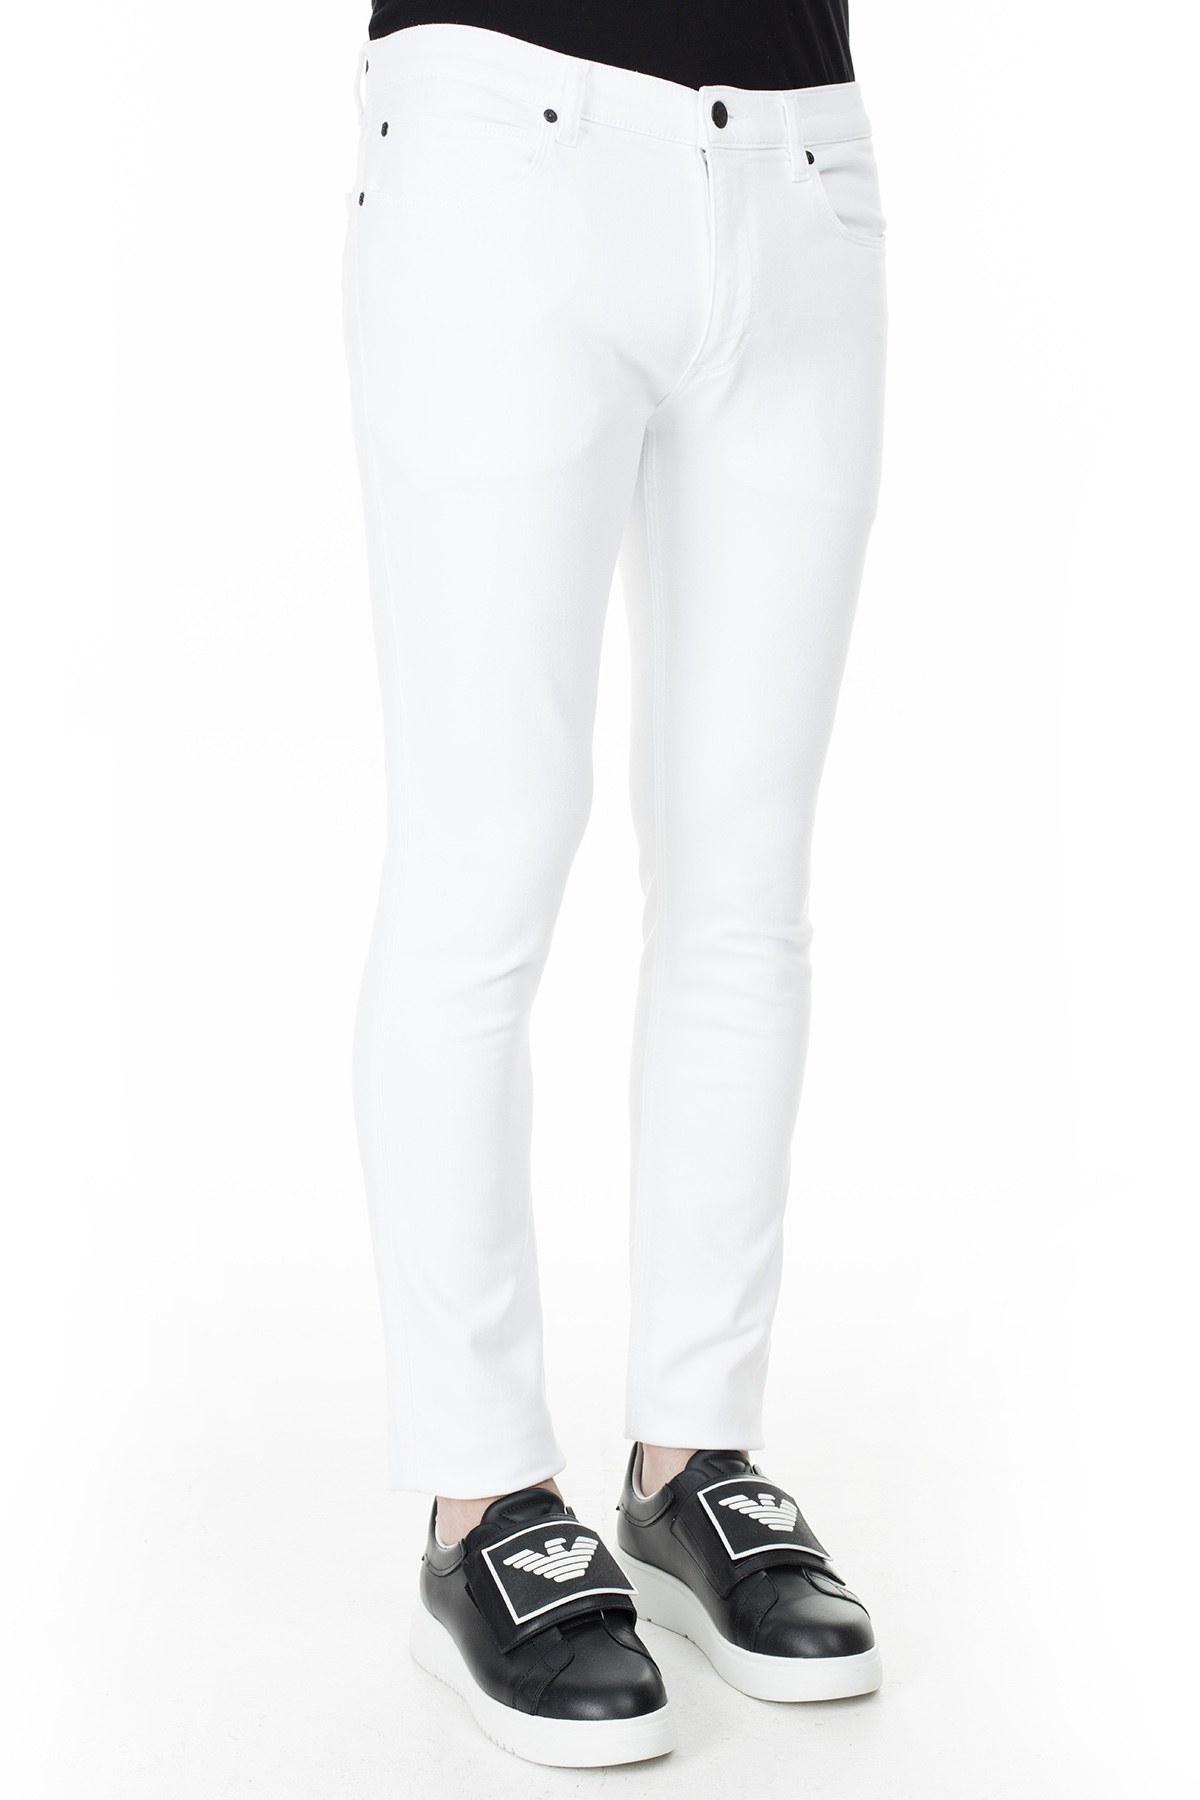 Hugo Boss Slim Fit Jeans Erkek Kot Pantolon 50426705 100 BEYAZ